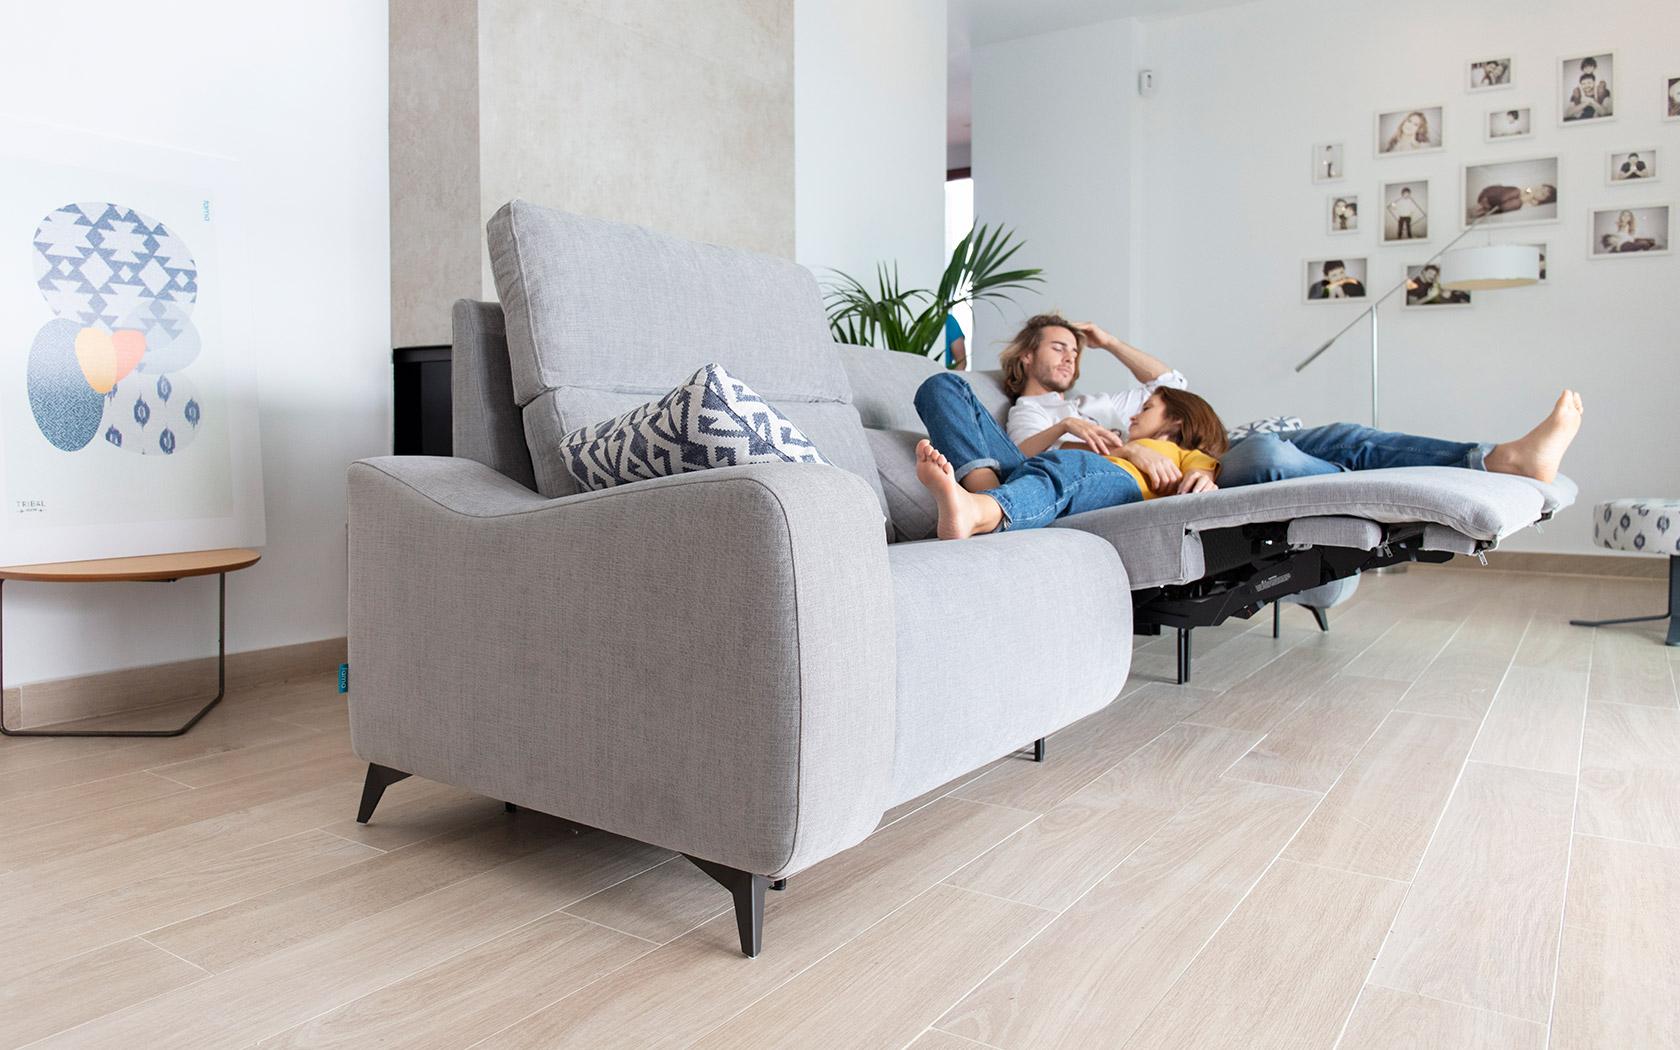 axel sofa 2021 07